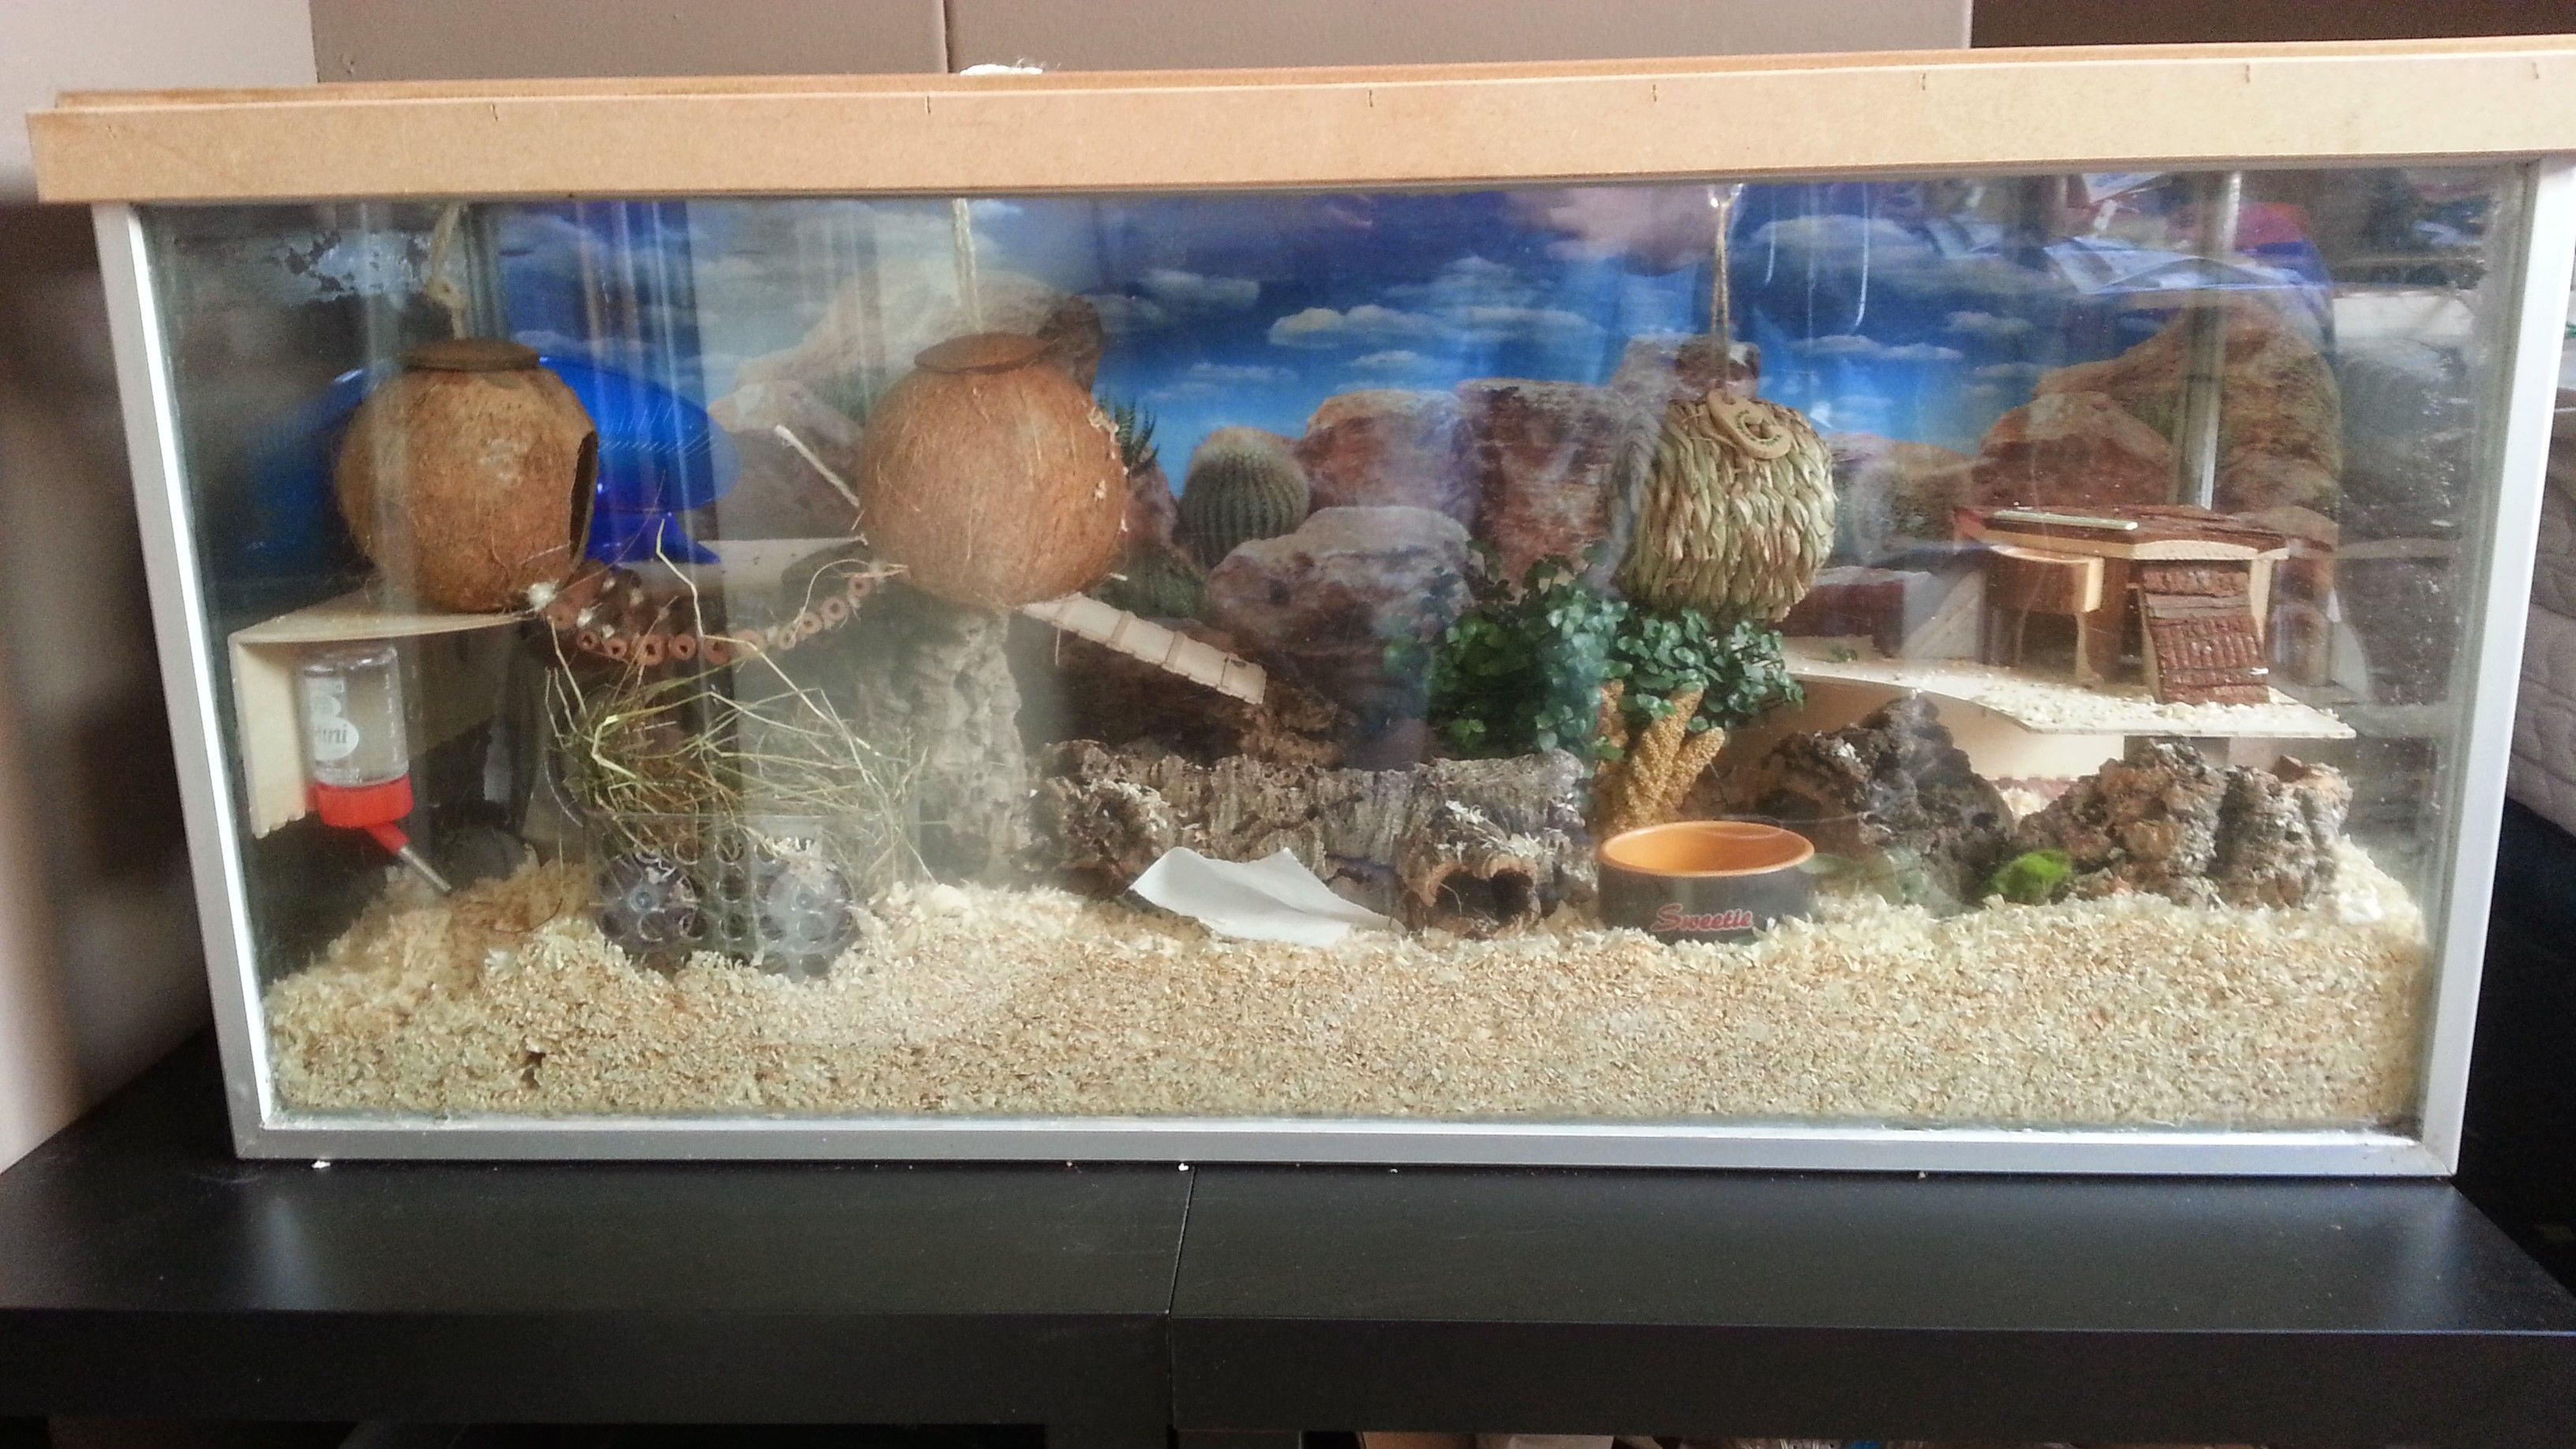 0f770d5e328f635ea2f3f87e383188b5 Luxe De Aquarium Plastique Conception